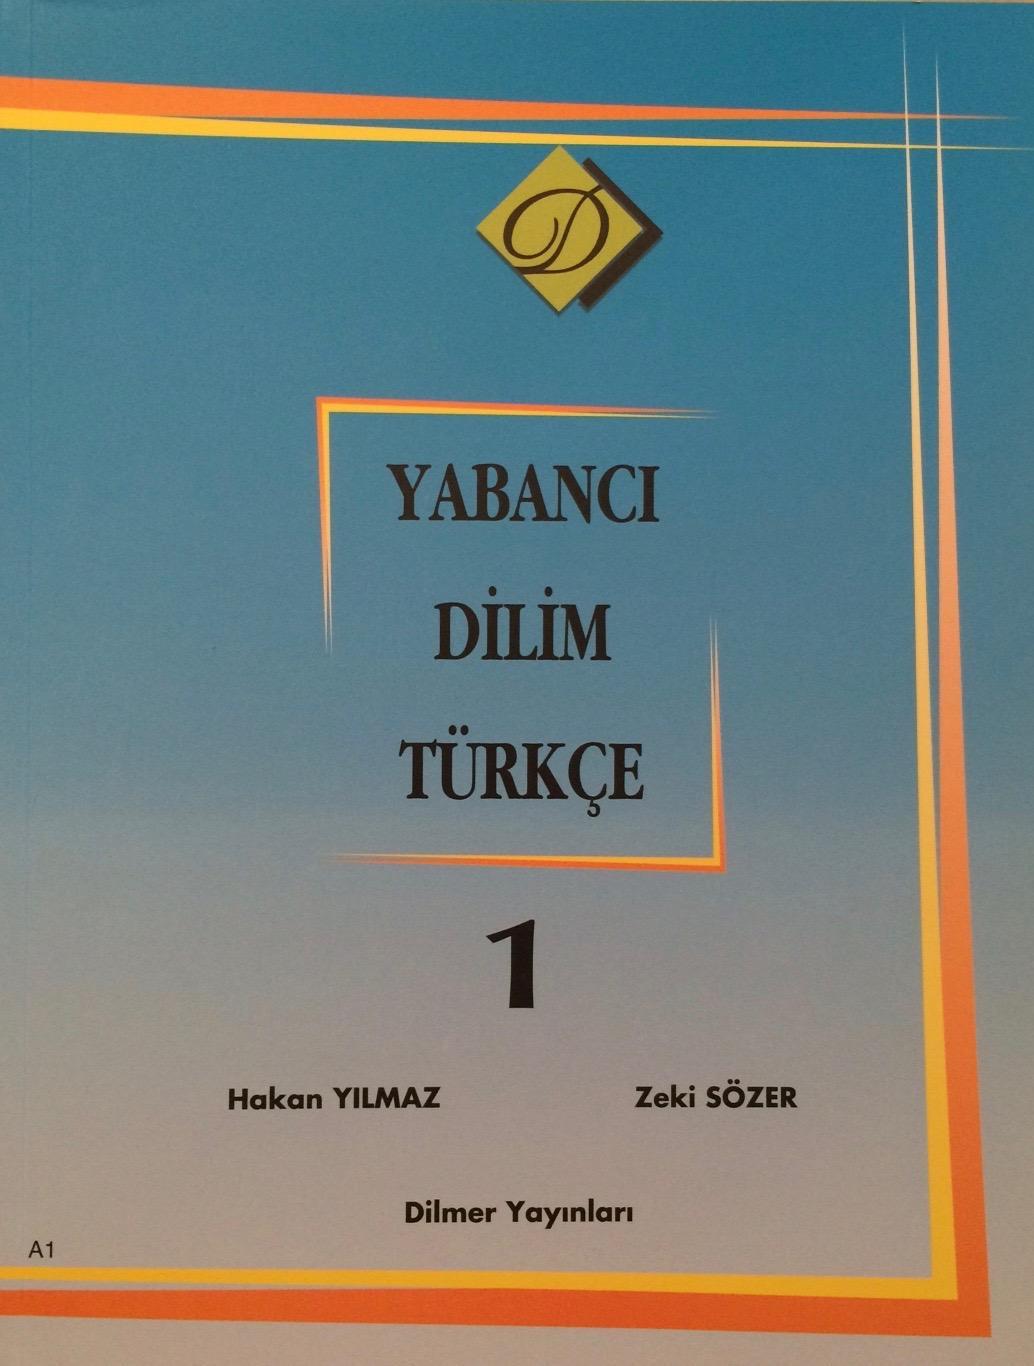 Yabanci Dilim Turkce Book 1 (Dilmer Turkish Language): Yilmaz & Sozer (Dilmer)